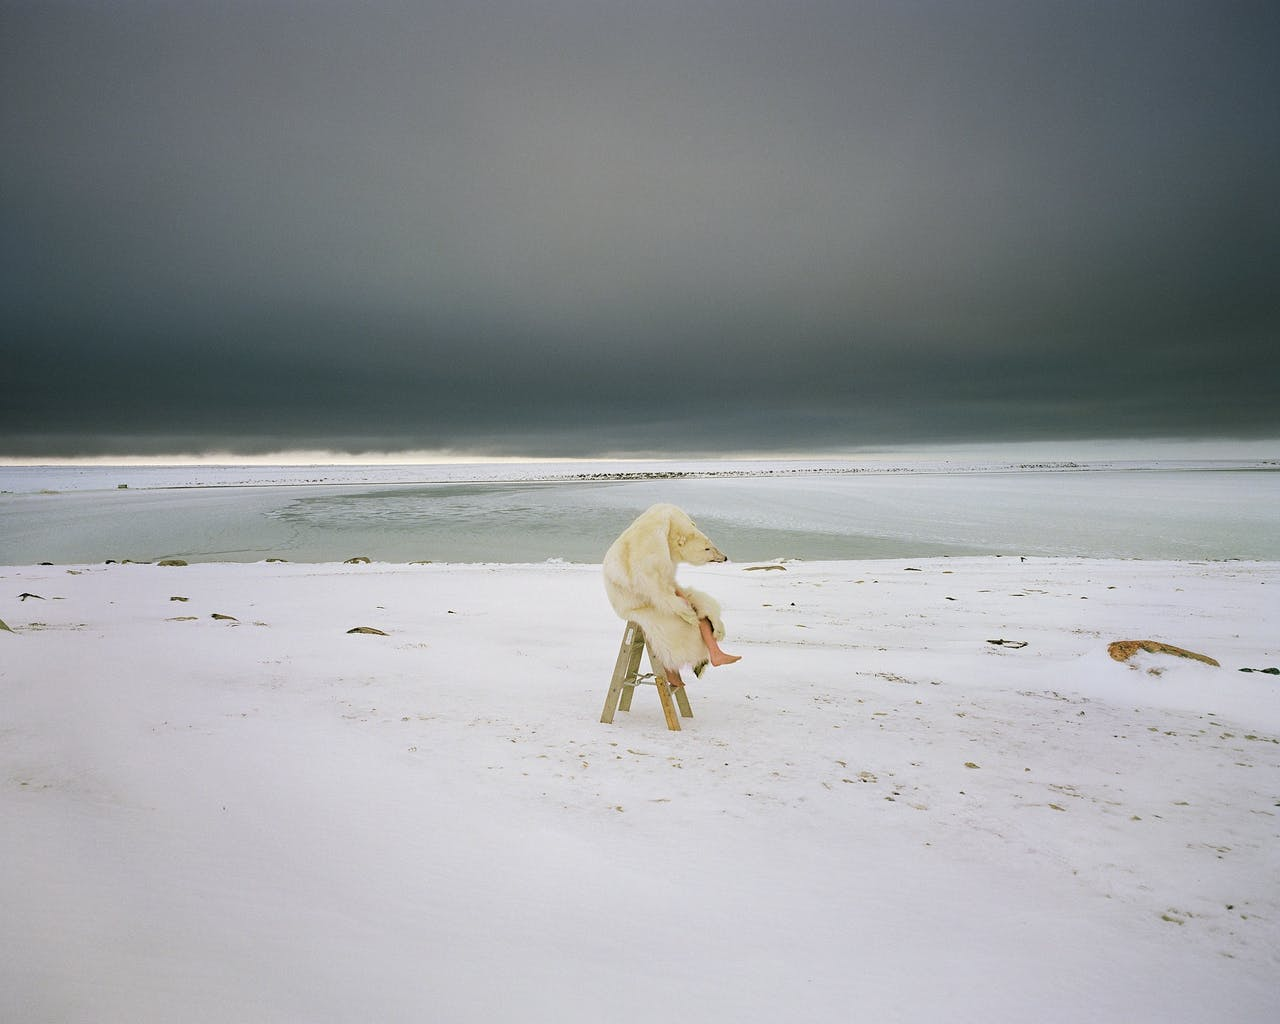 Polar Bear, 2007, Scarlett Hooft Graafland.